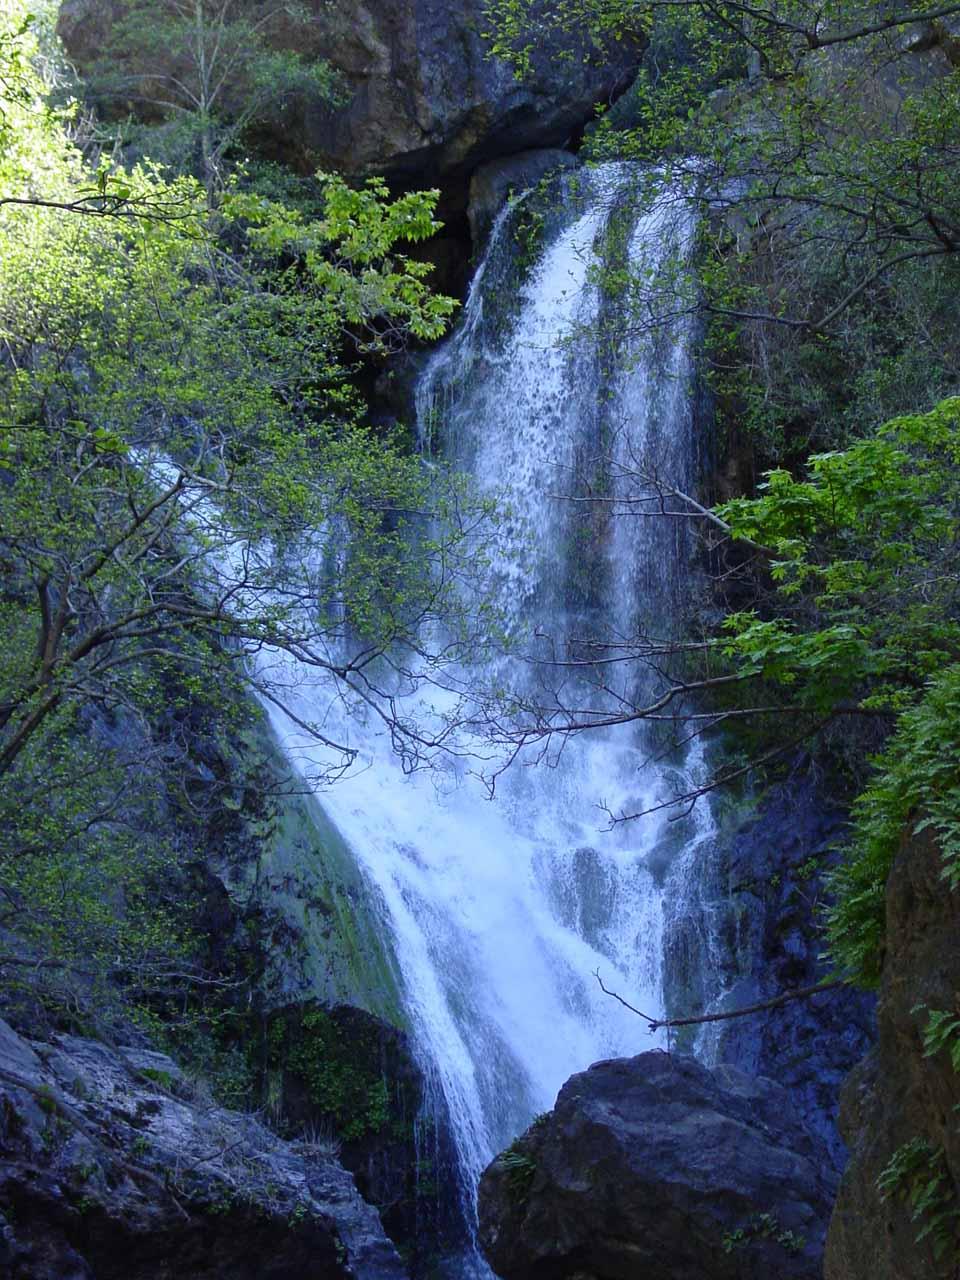 Closeup of the main plunge of Salmon Creek Falls in 2003